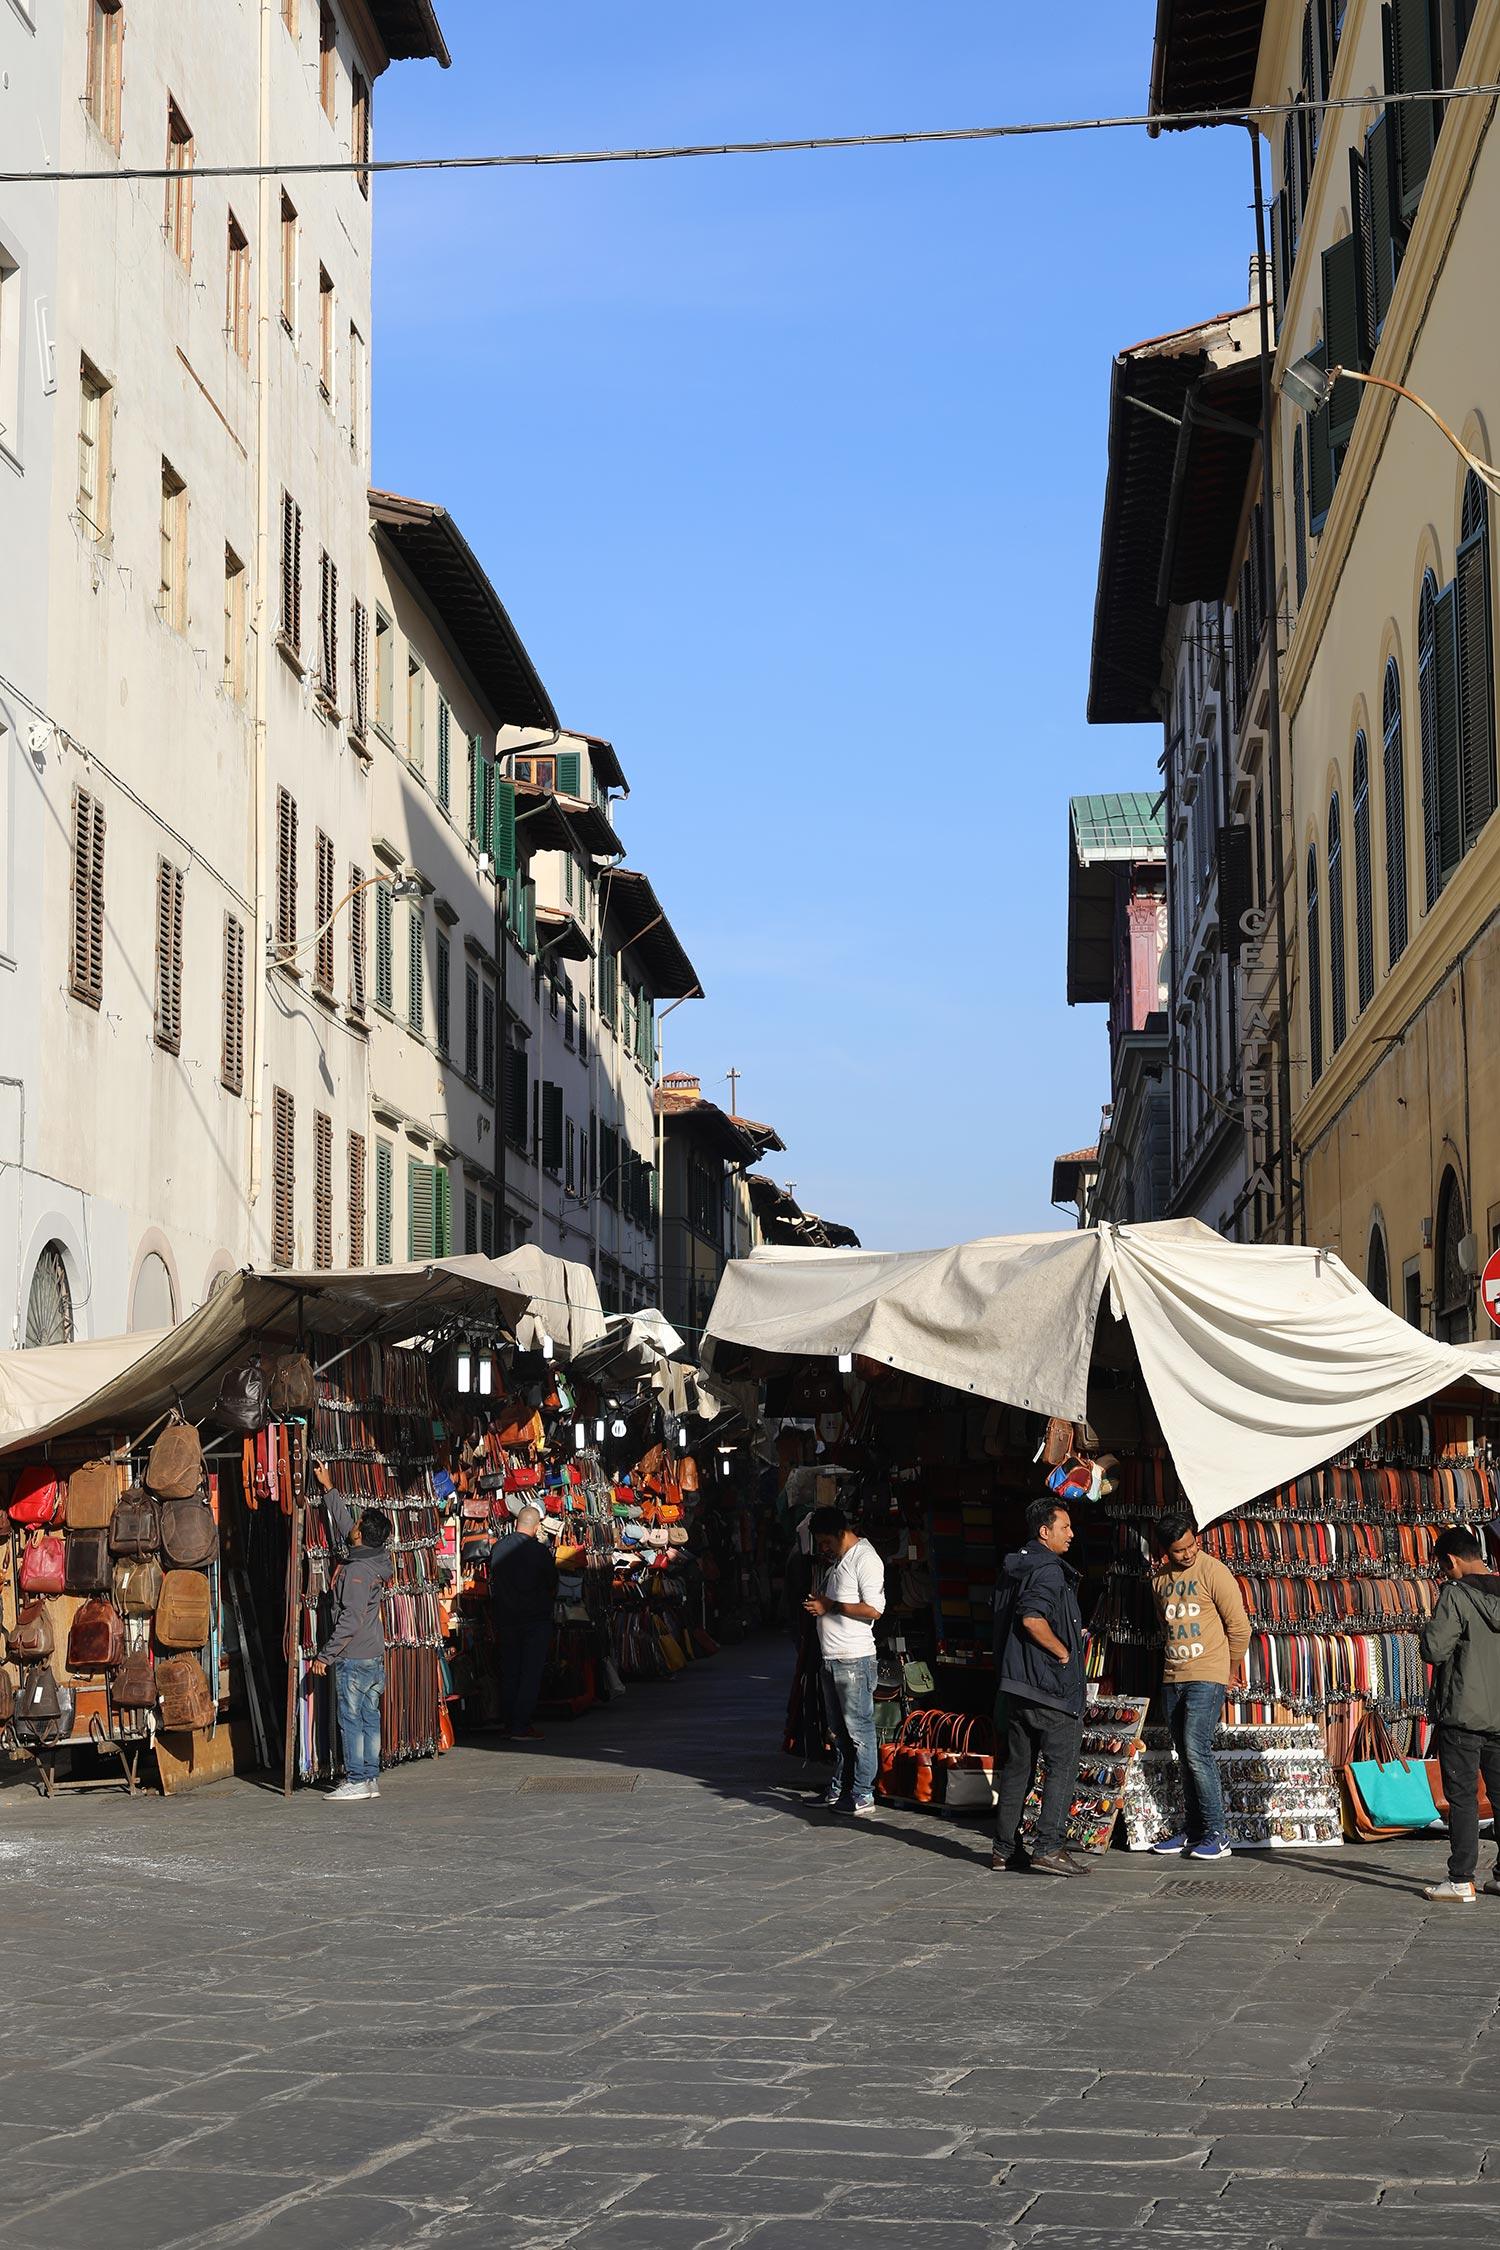 Pilgrimage_Rome_4280_Florence.jpg